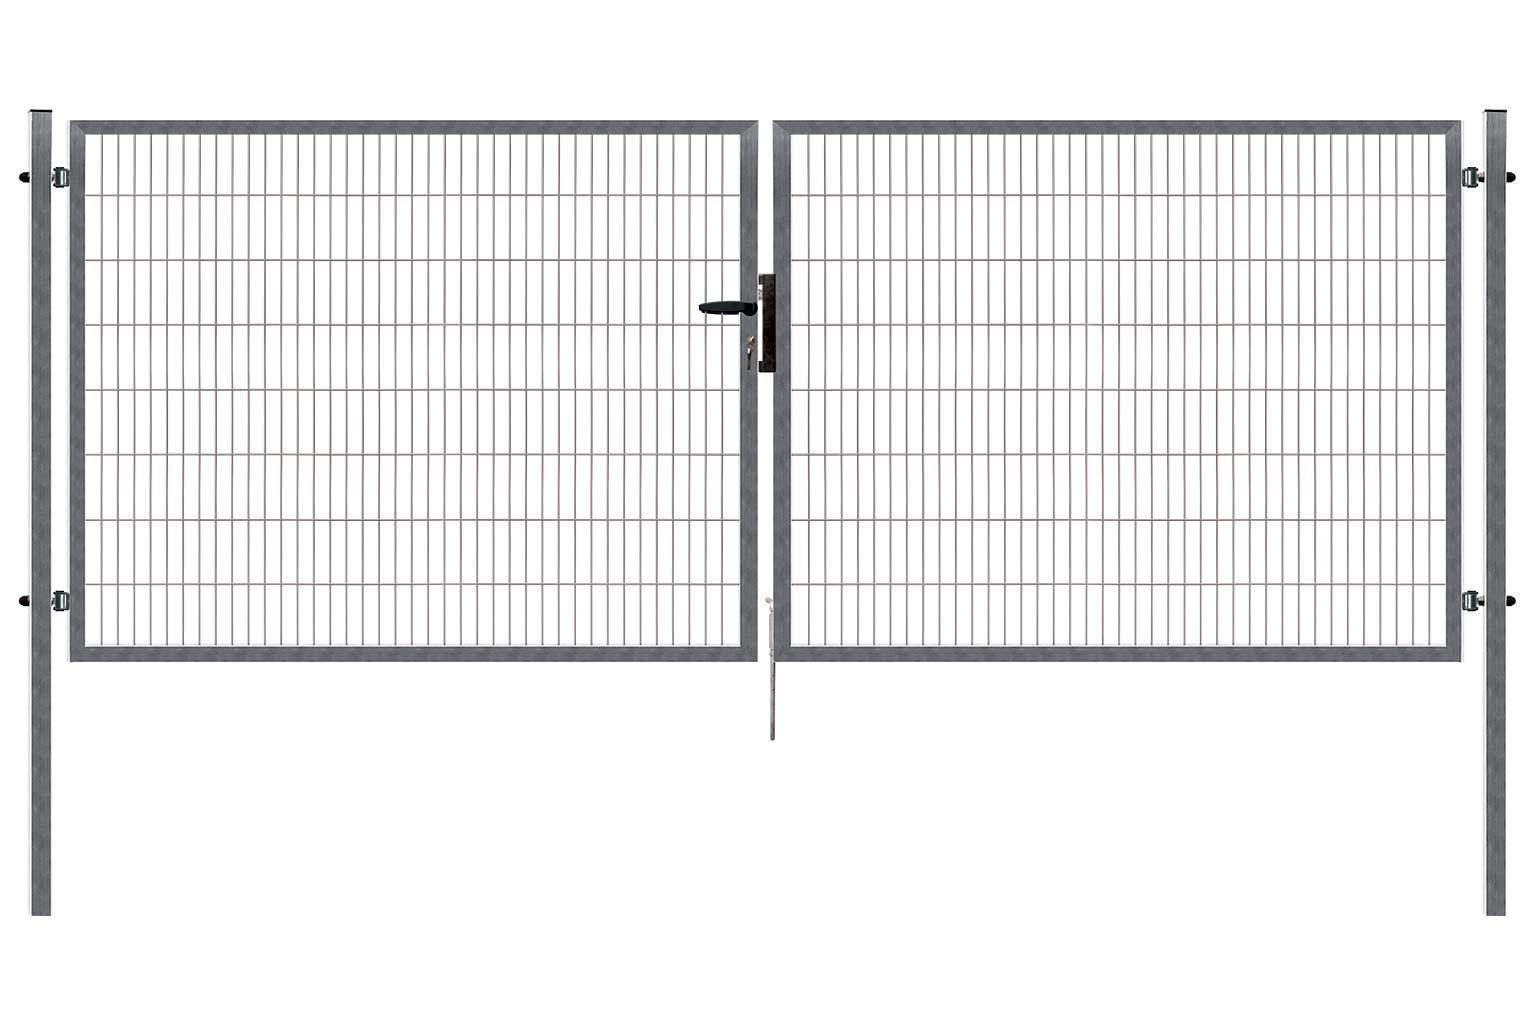 Brána PILOFOR SUPER dvoukřídlá, 4090x1380 mm, Zn 54,7Kg